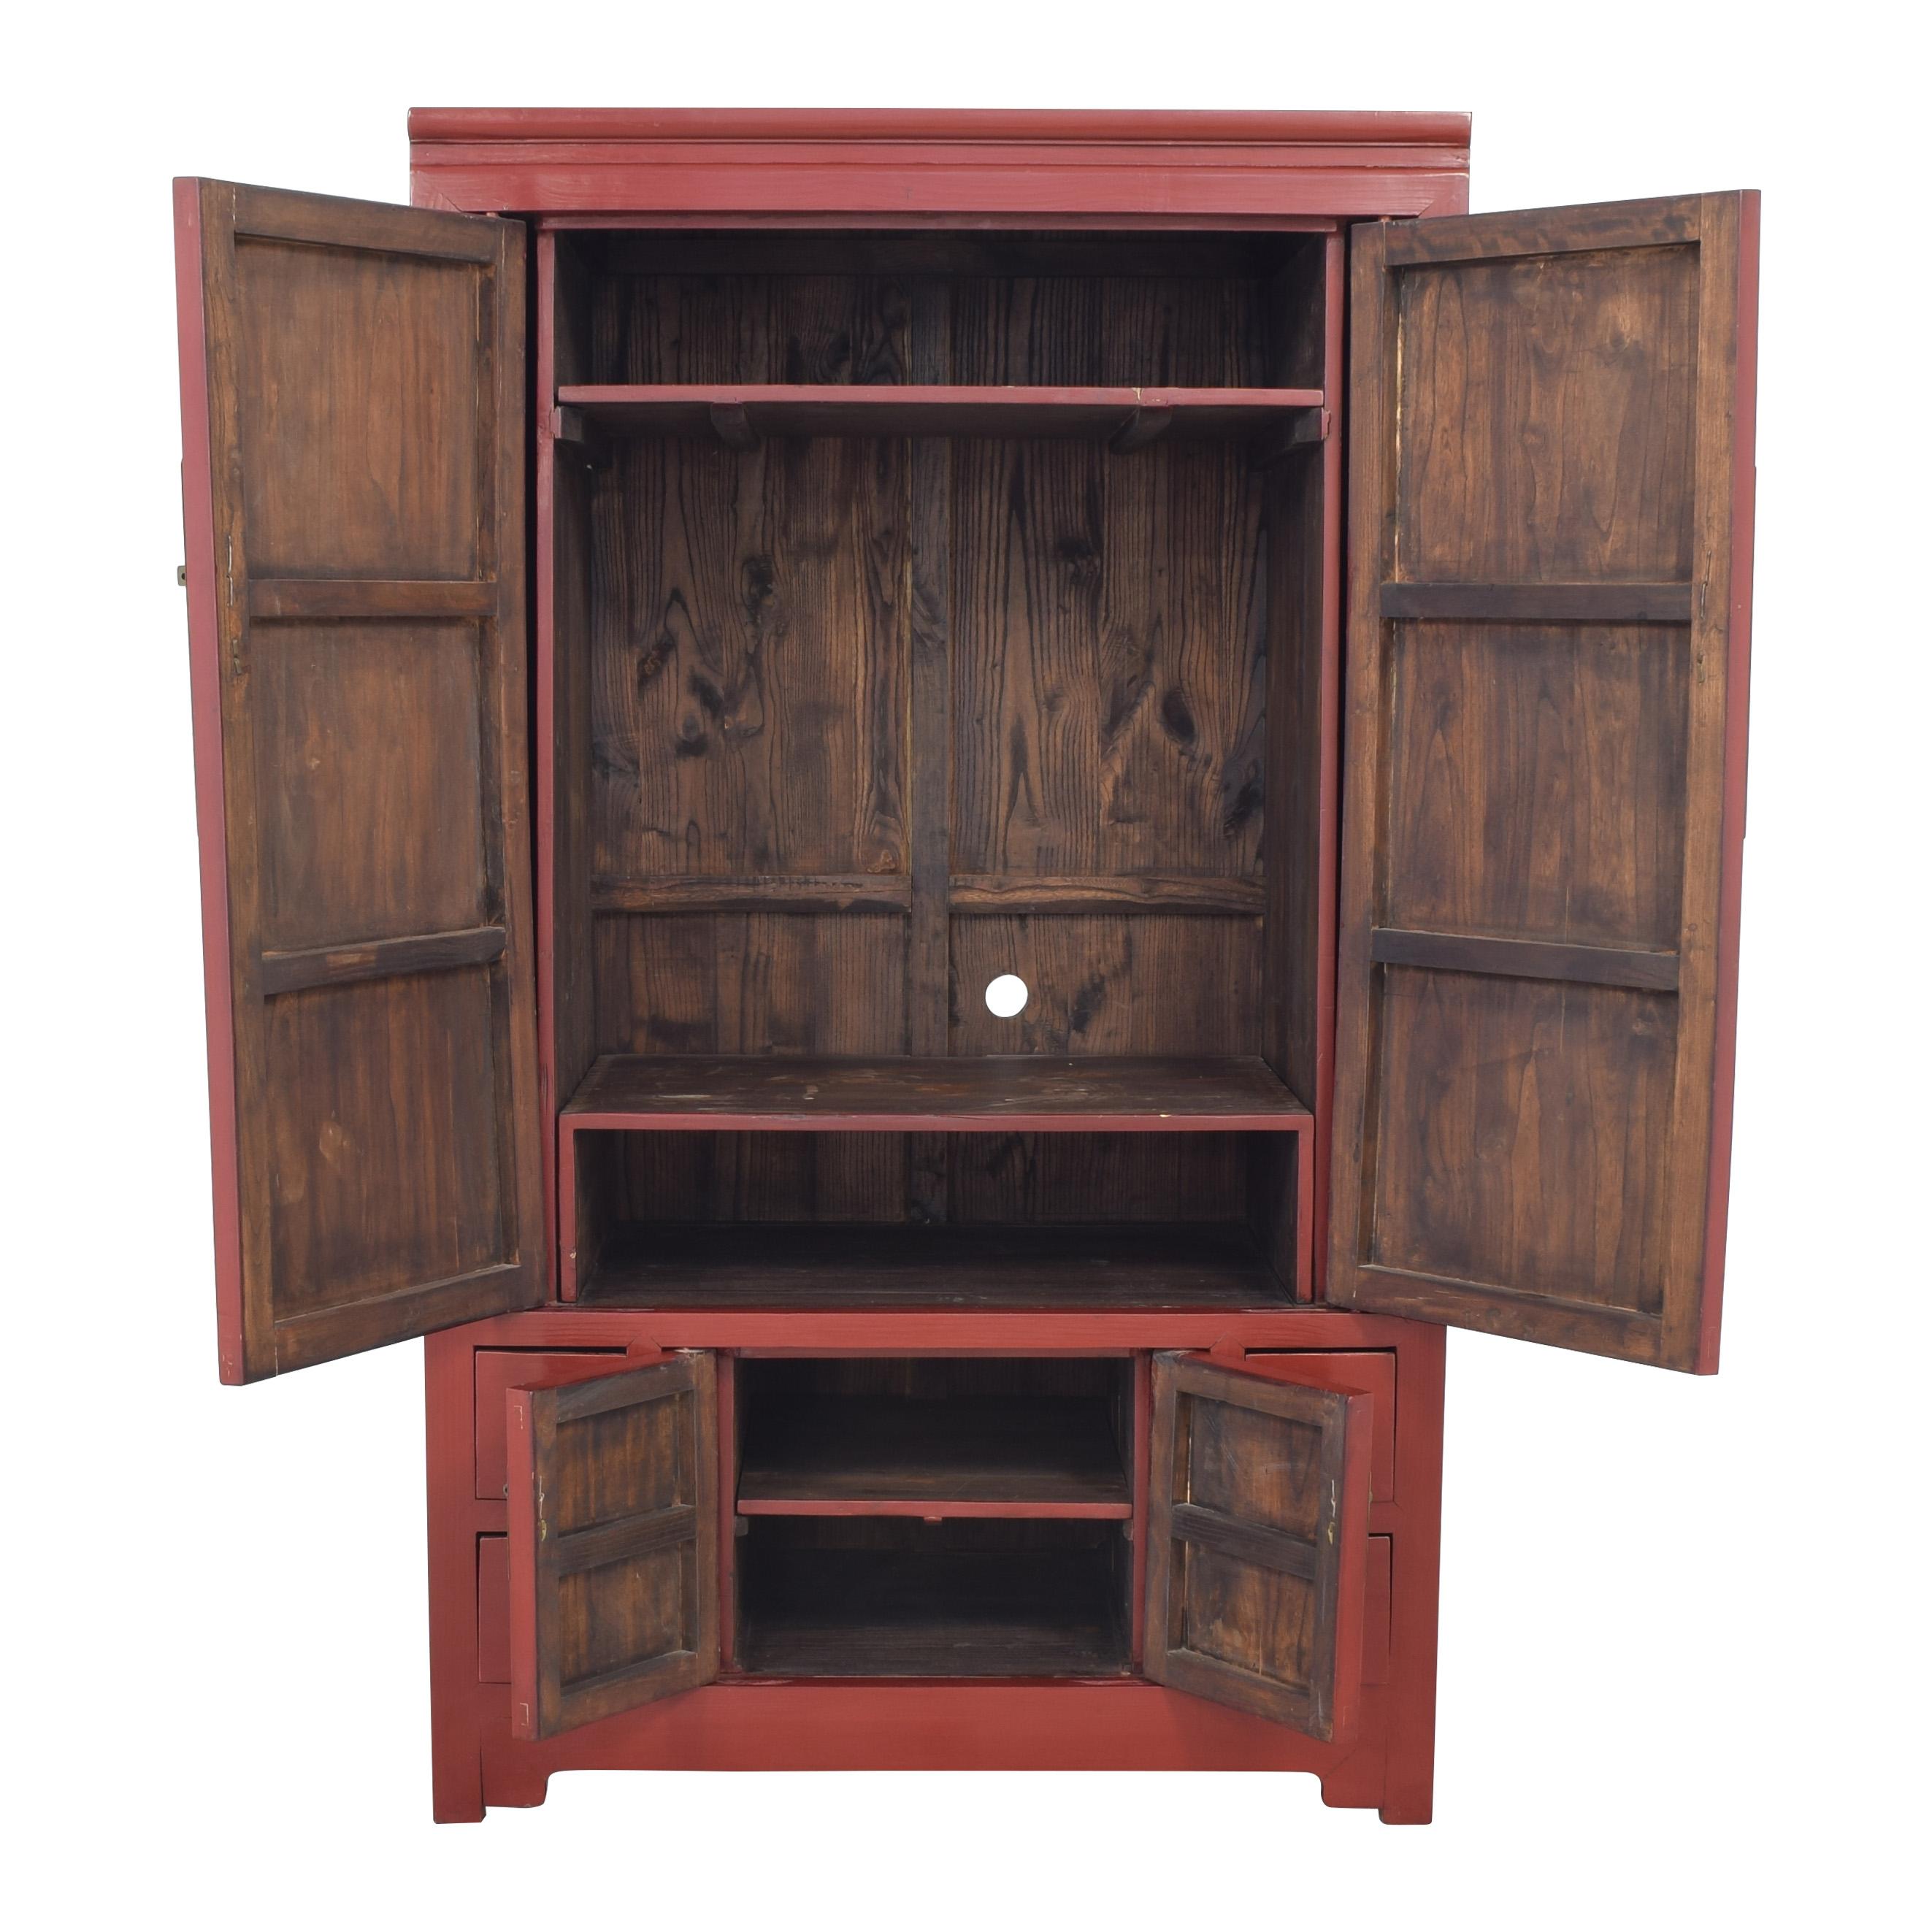 Ballard Designs Kowloon Cabinet for sale